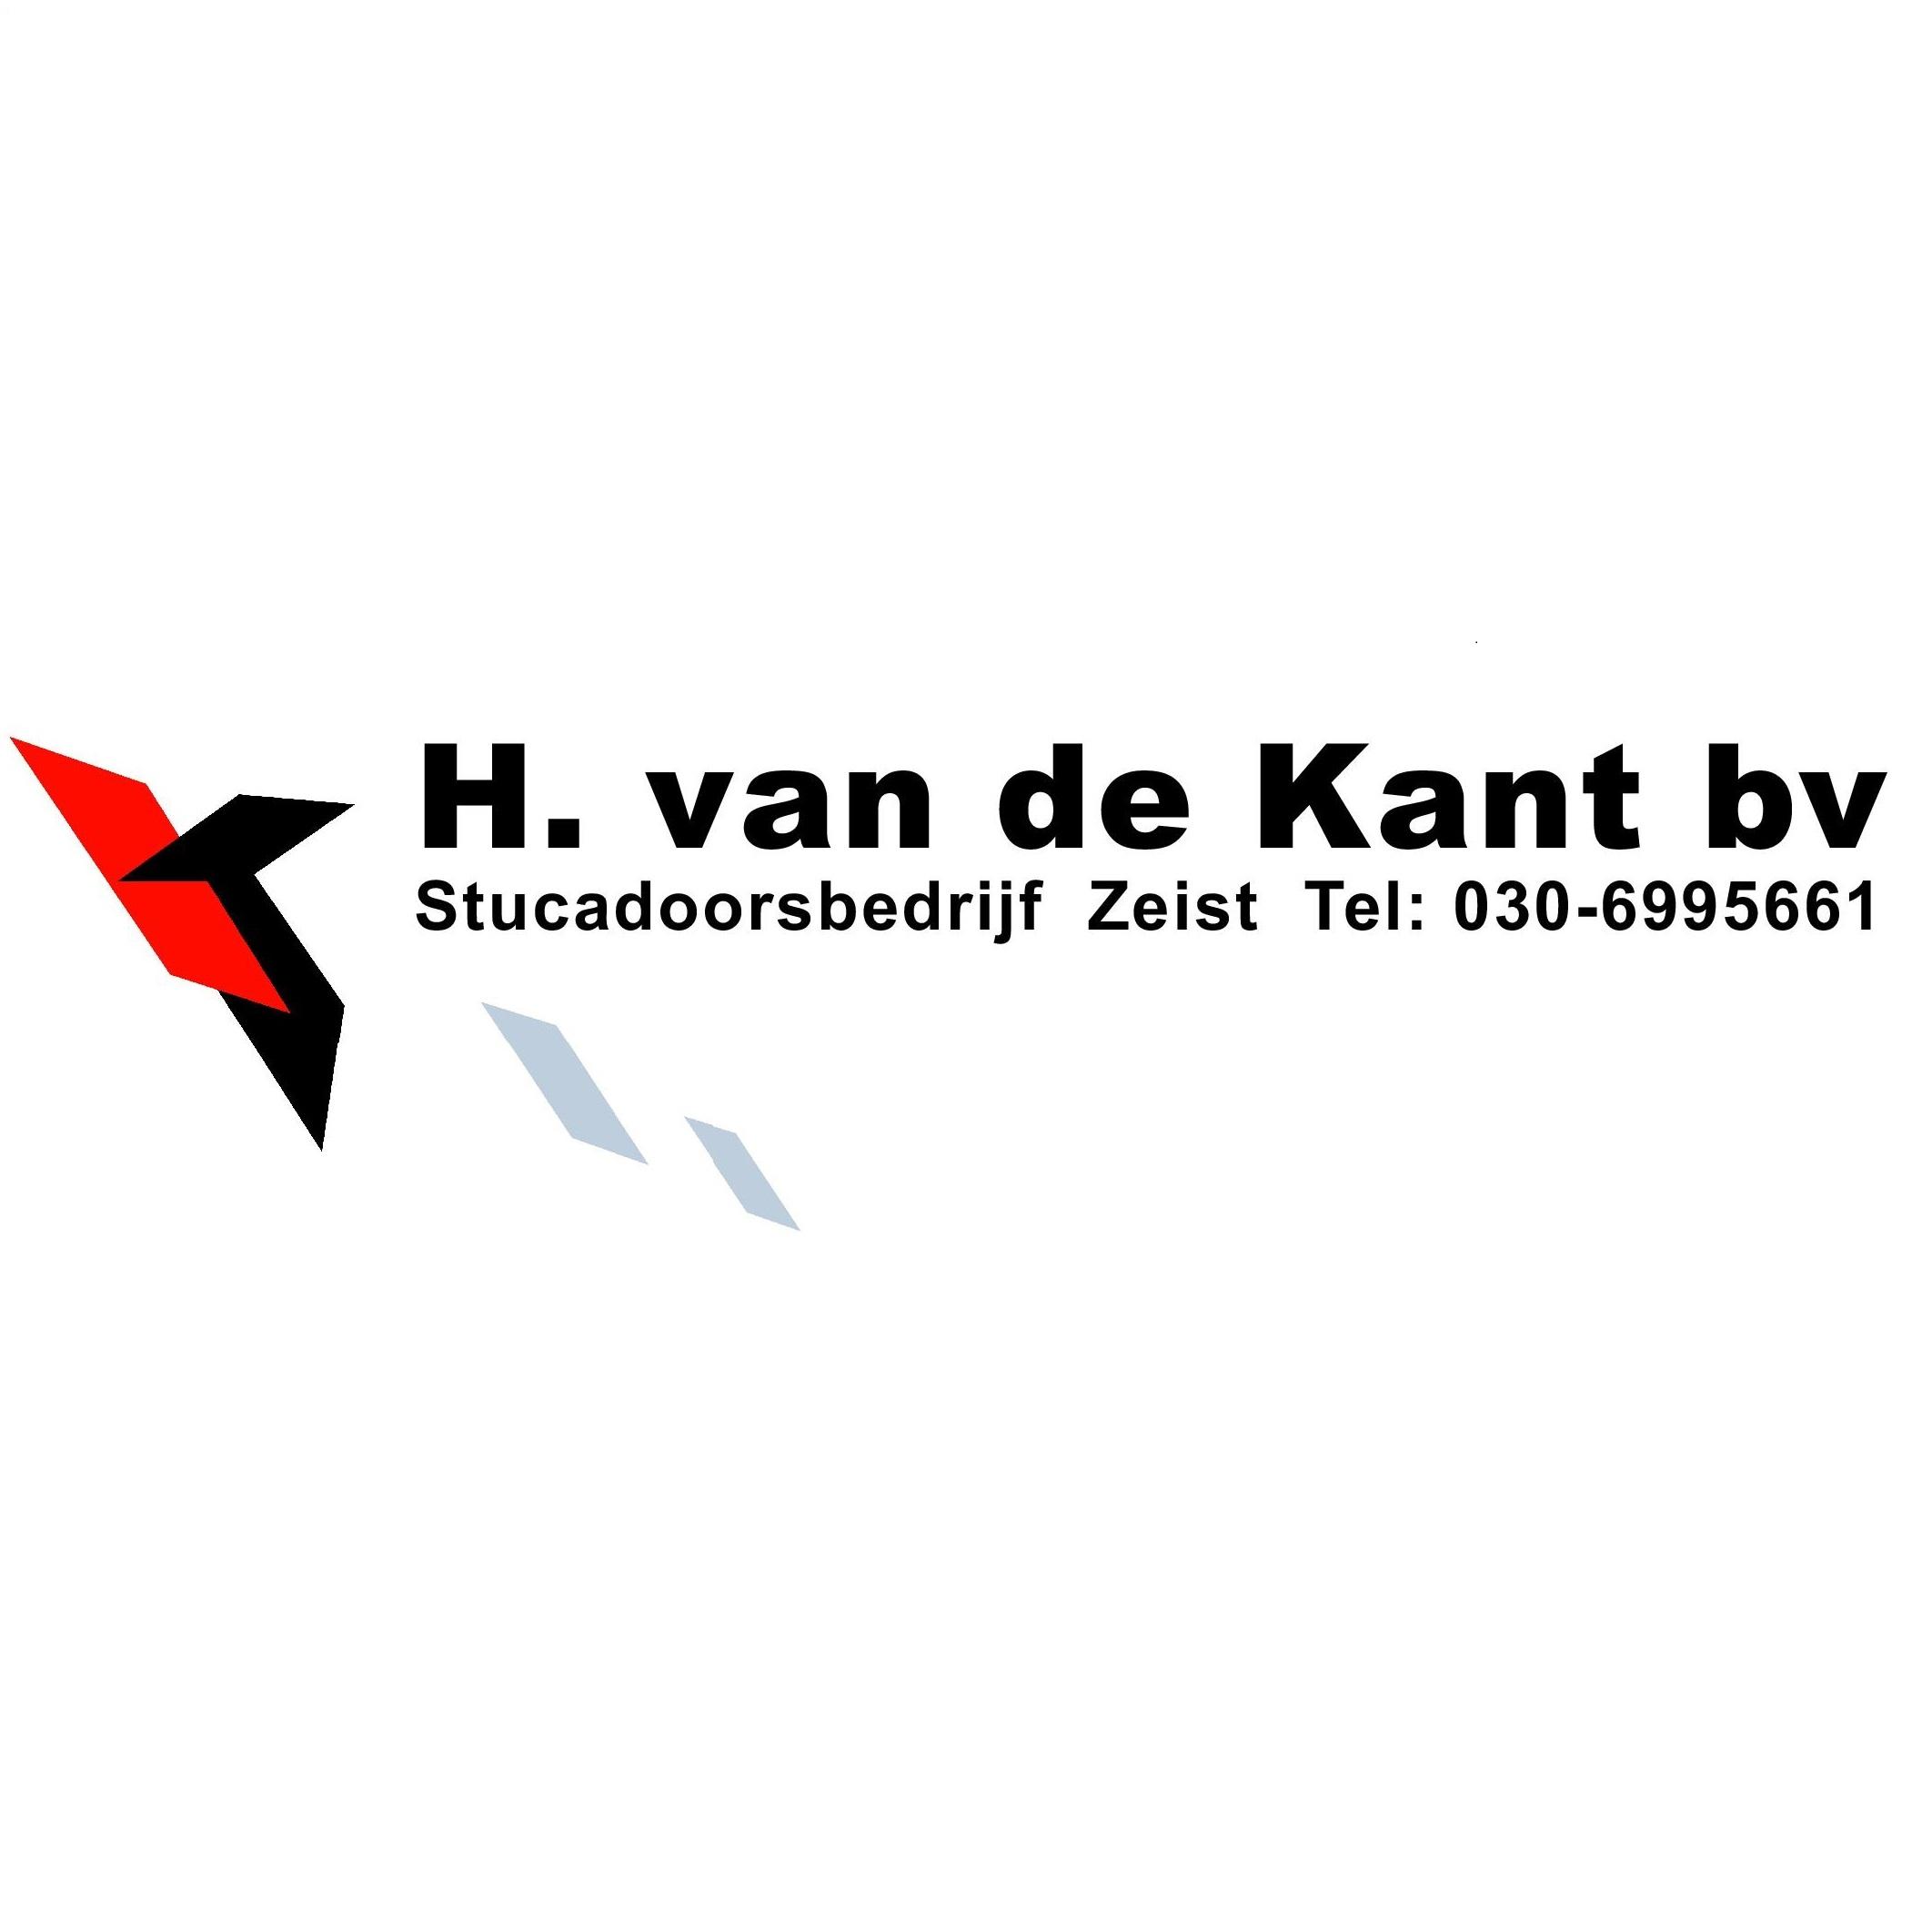 Van der Kant